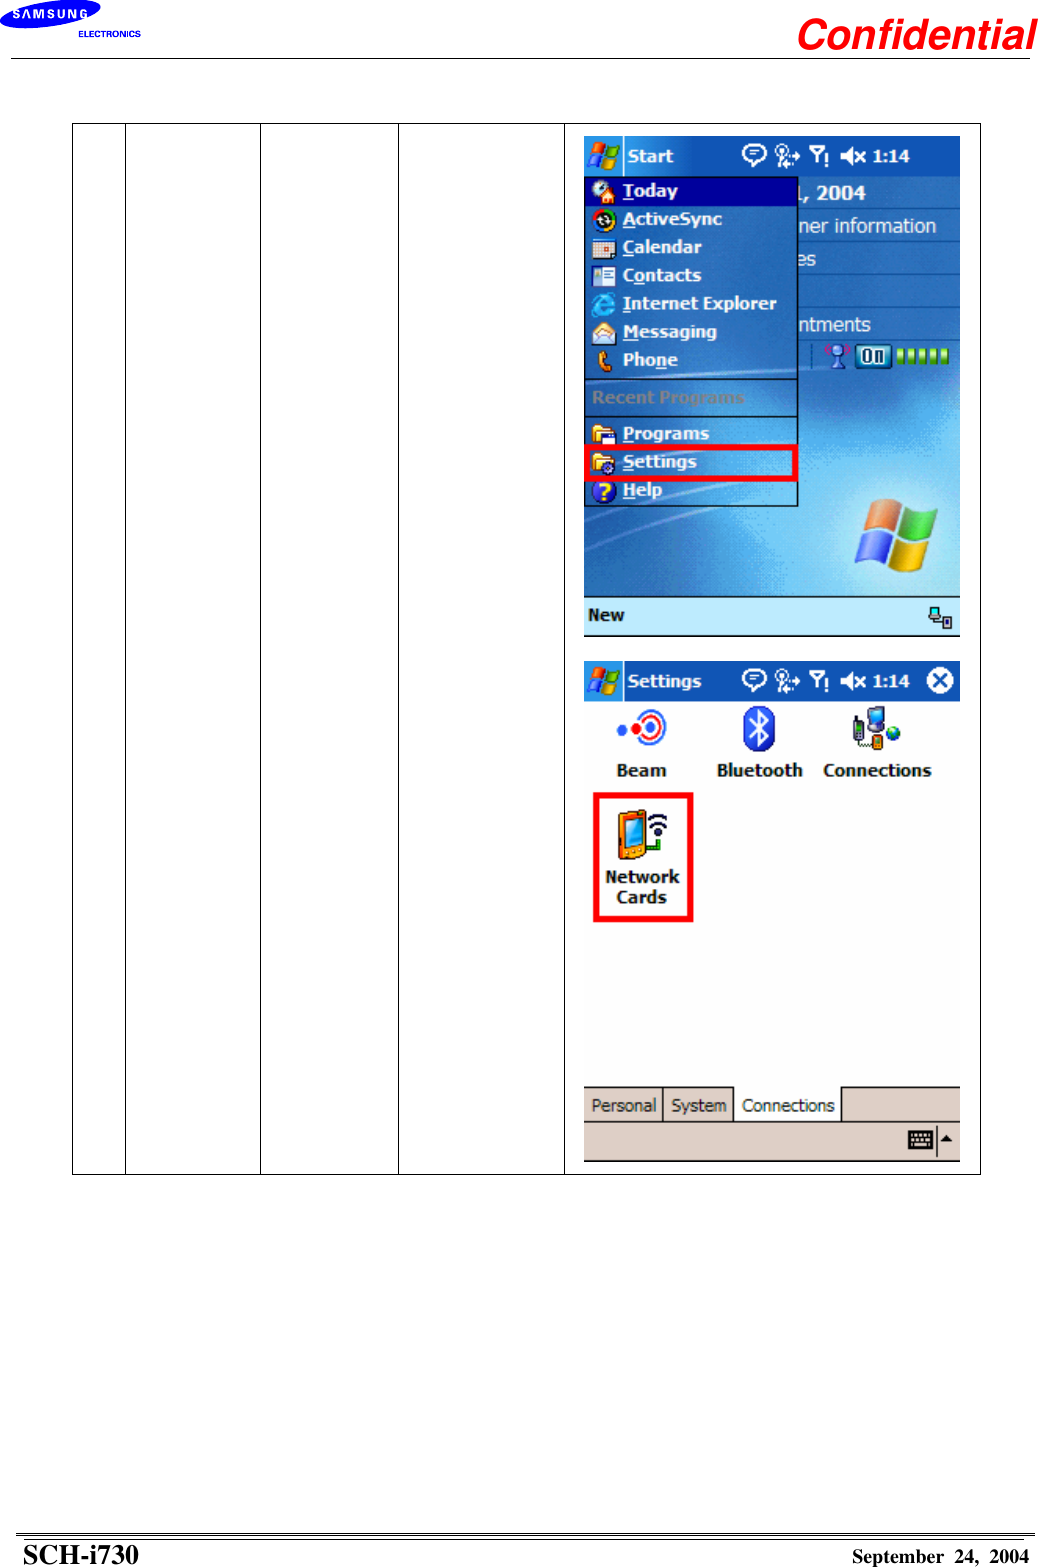 samsung electronics co schi730 dual band cdma phone w wlan rh usermanual wiki Samsung RFG298 Manual Samsung Galaxy S3 User Guide